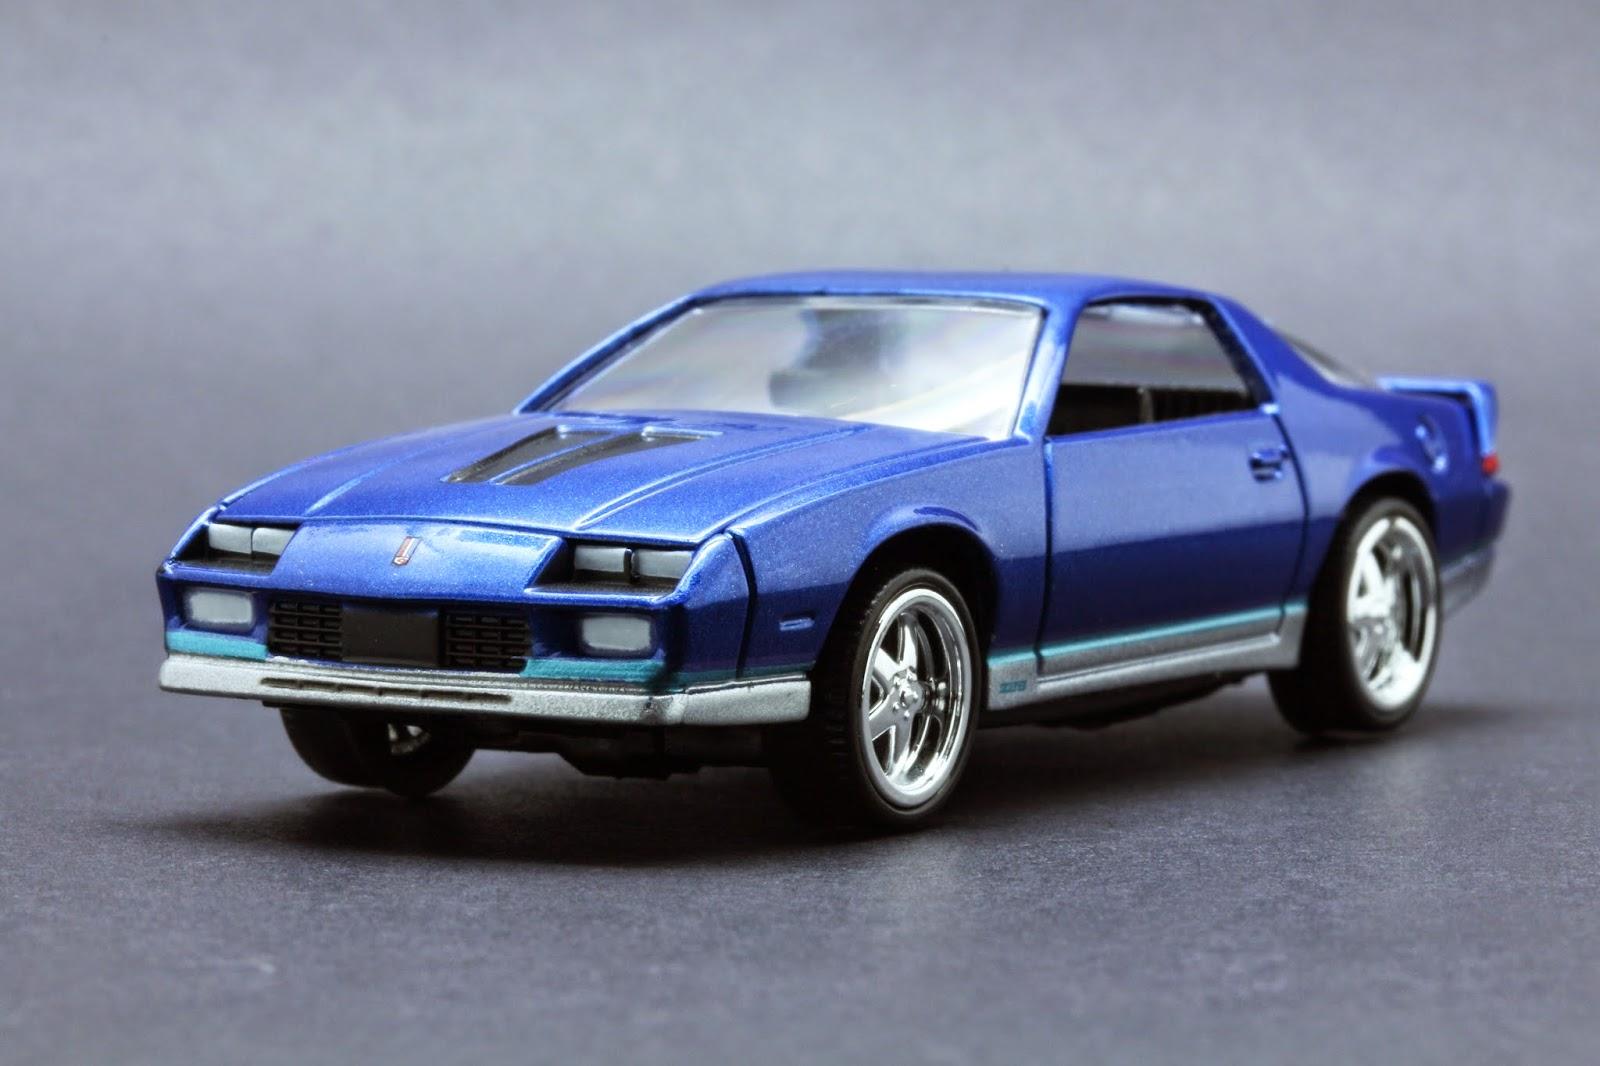 Chevrolet Camaro Z28 in Blau Auto World 1:64 1984